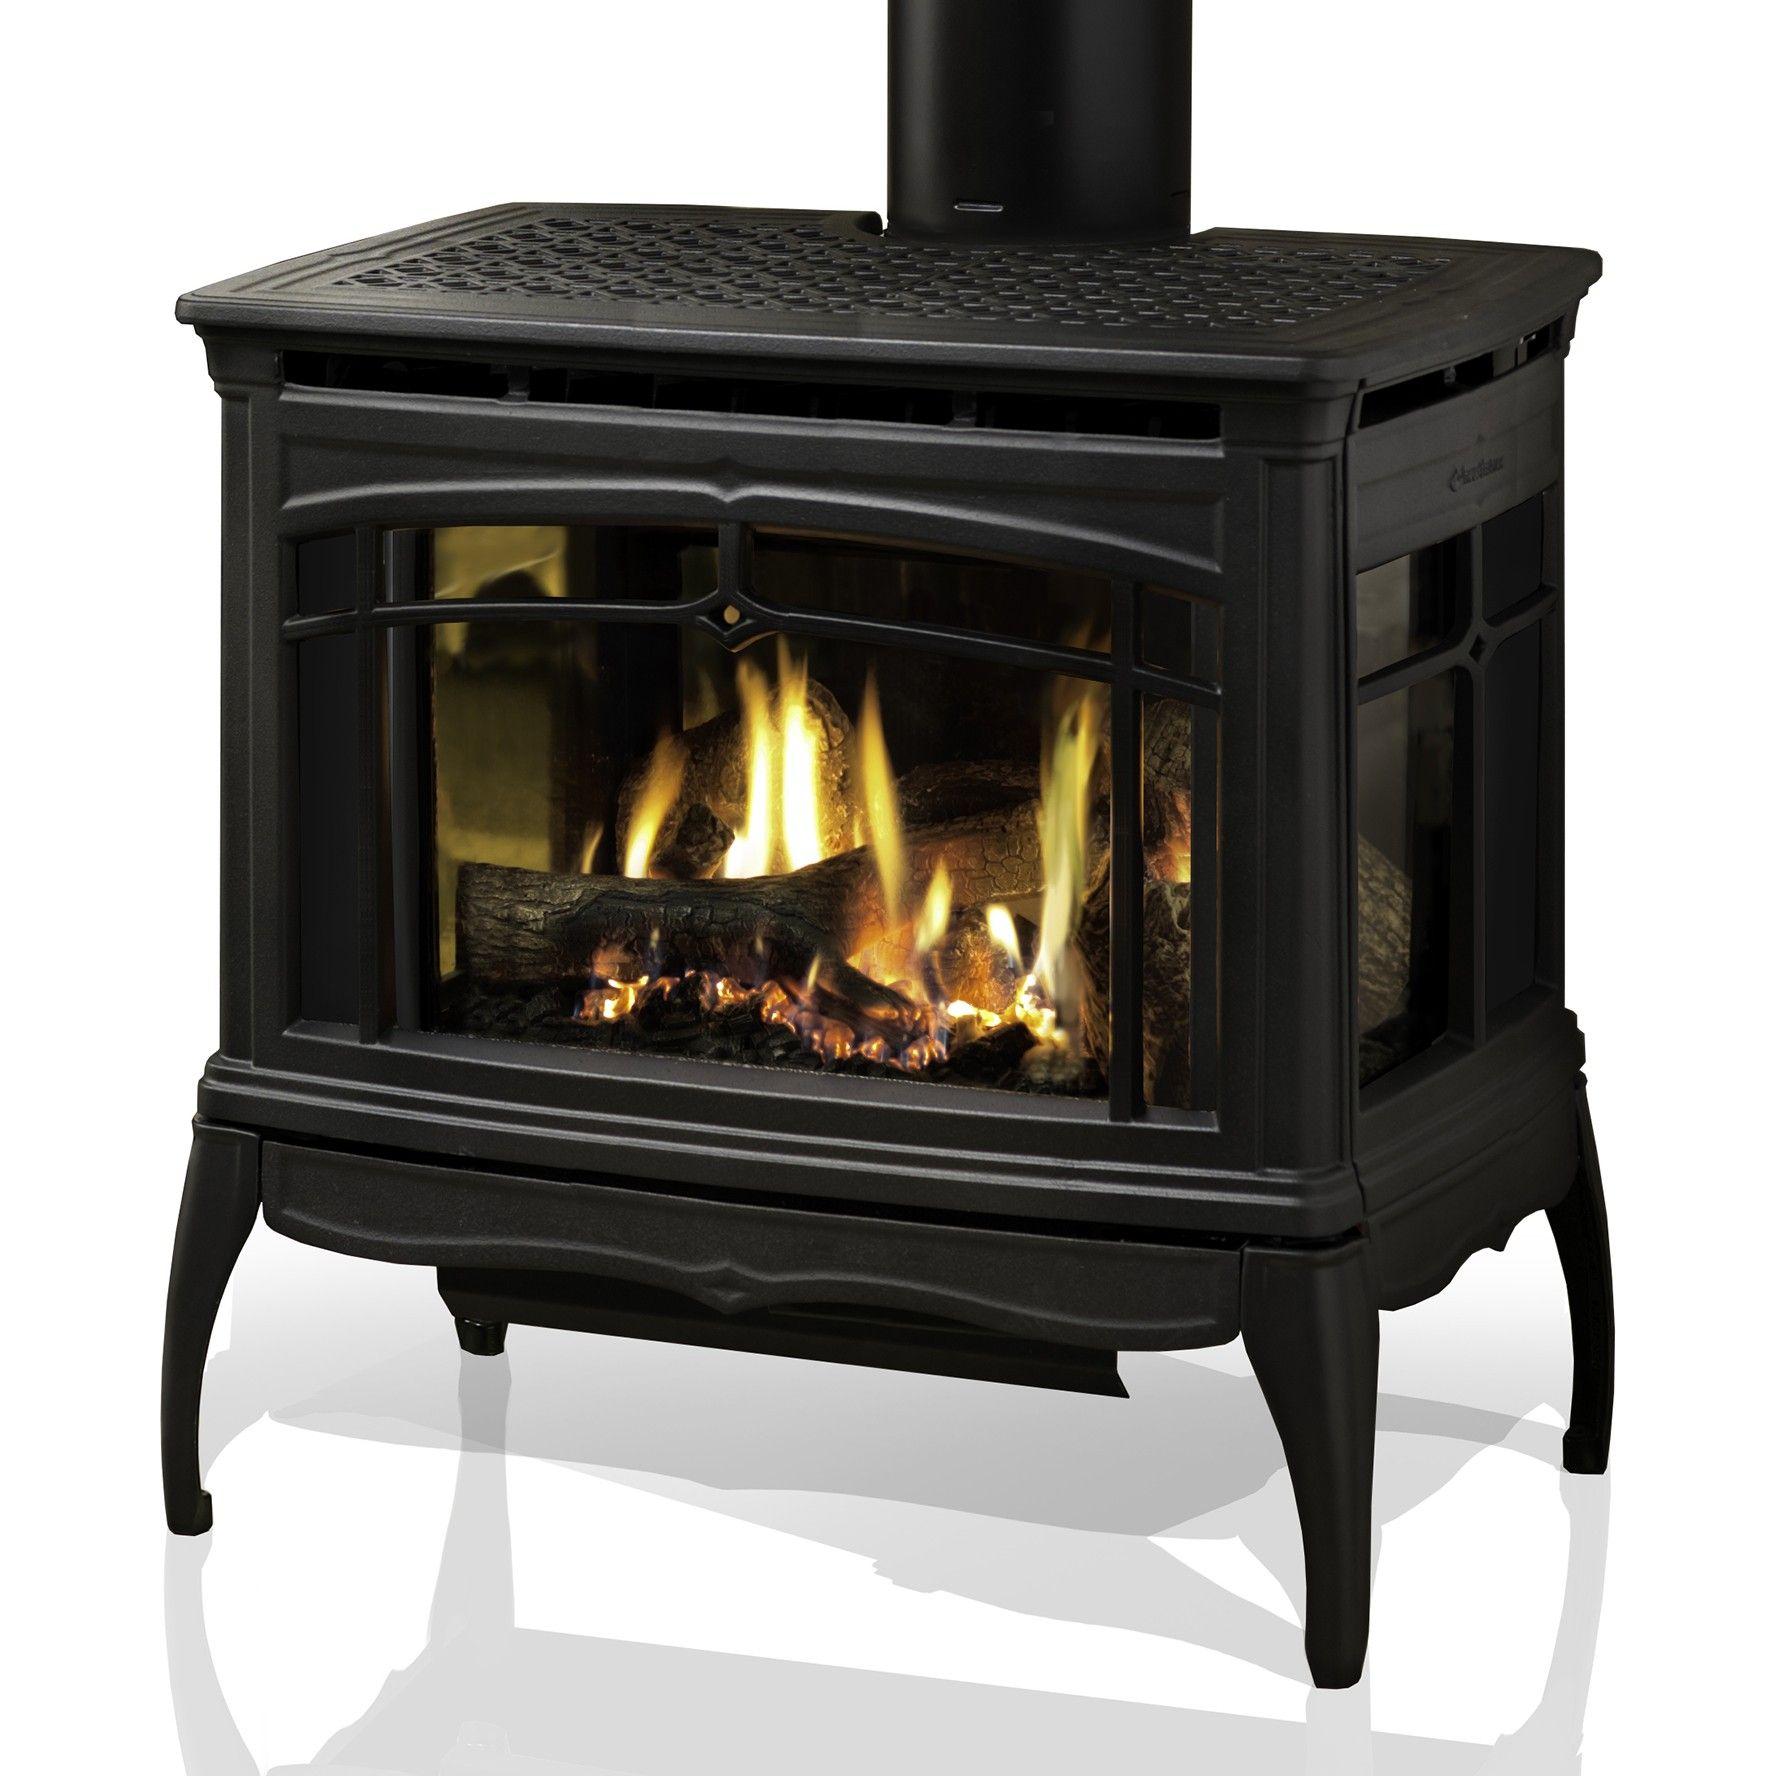 Hearthstone Fireplace Insert Inspirational Hearthstone Waitsfield Dx 8770 Gas Stove